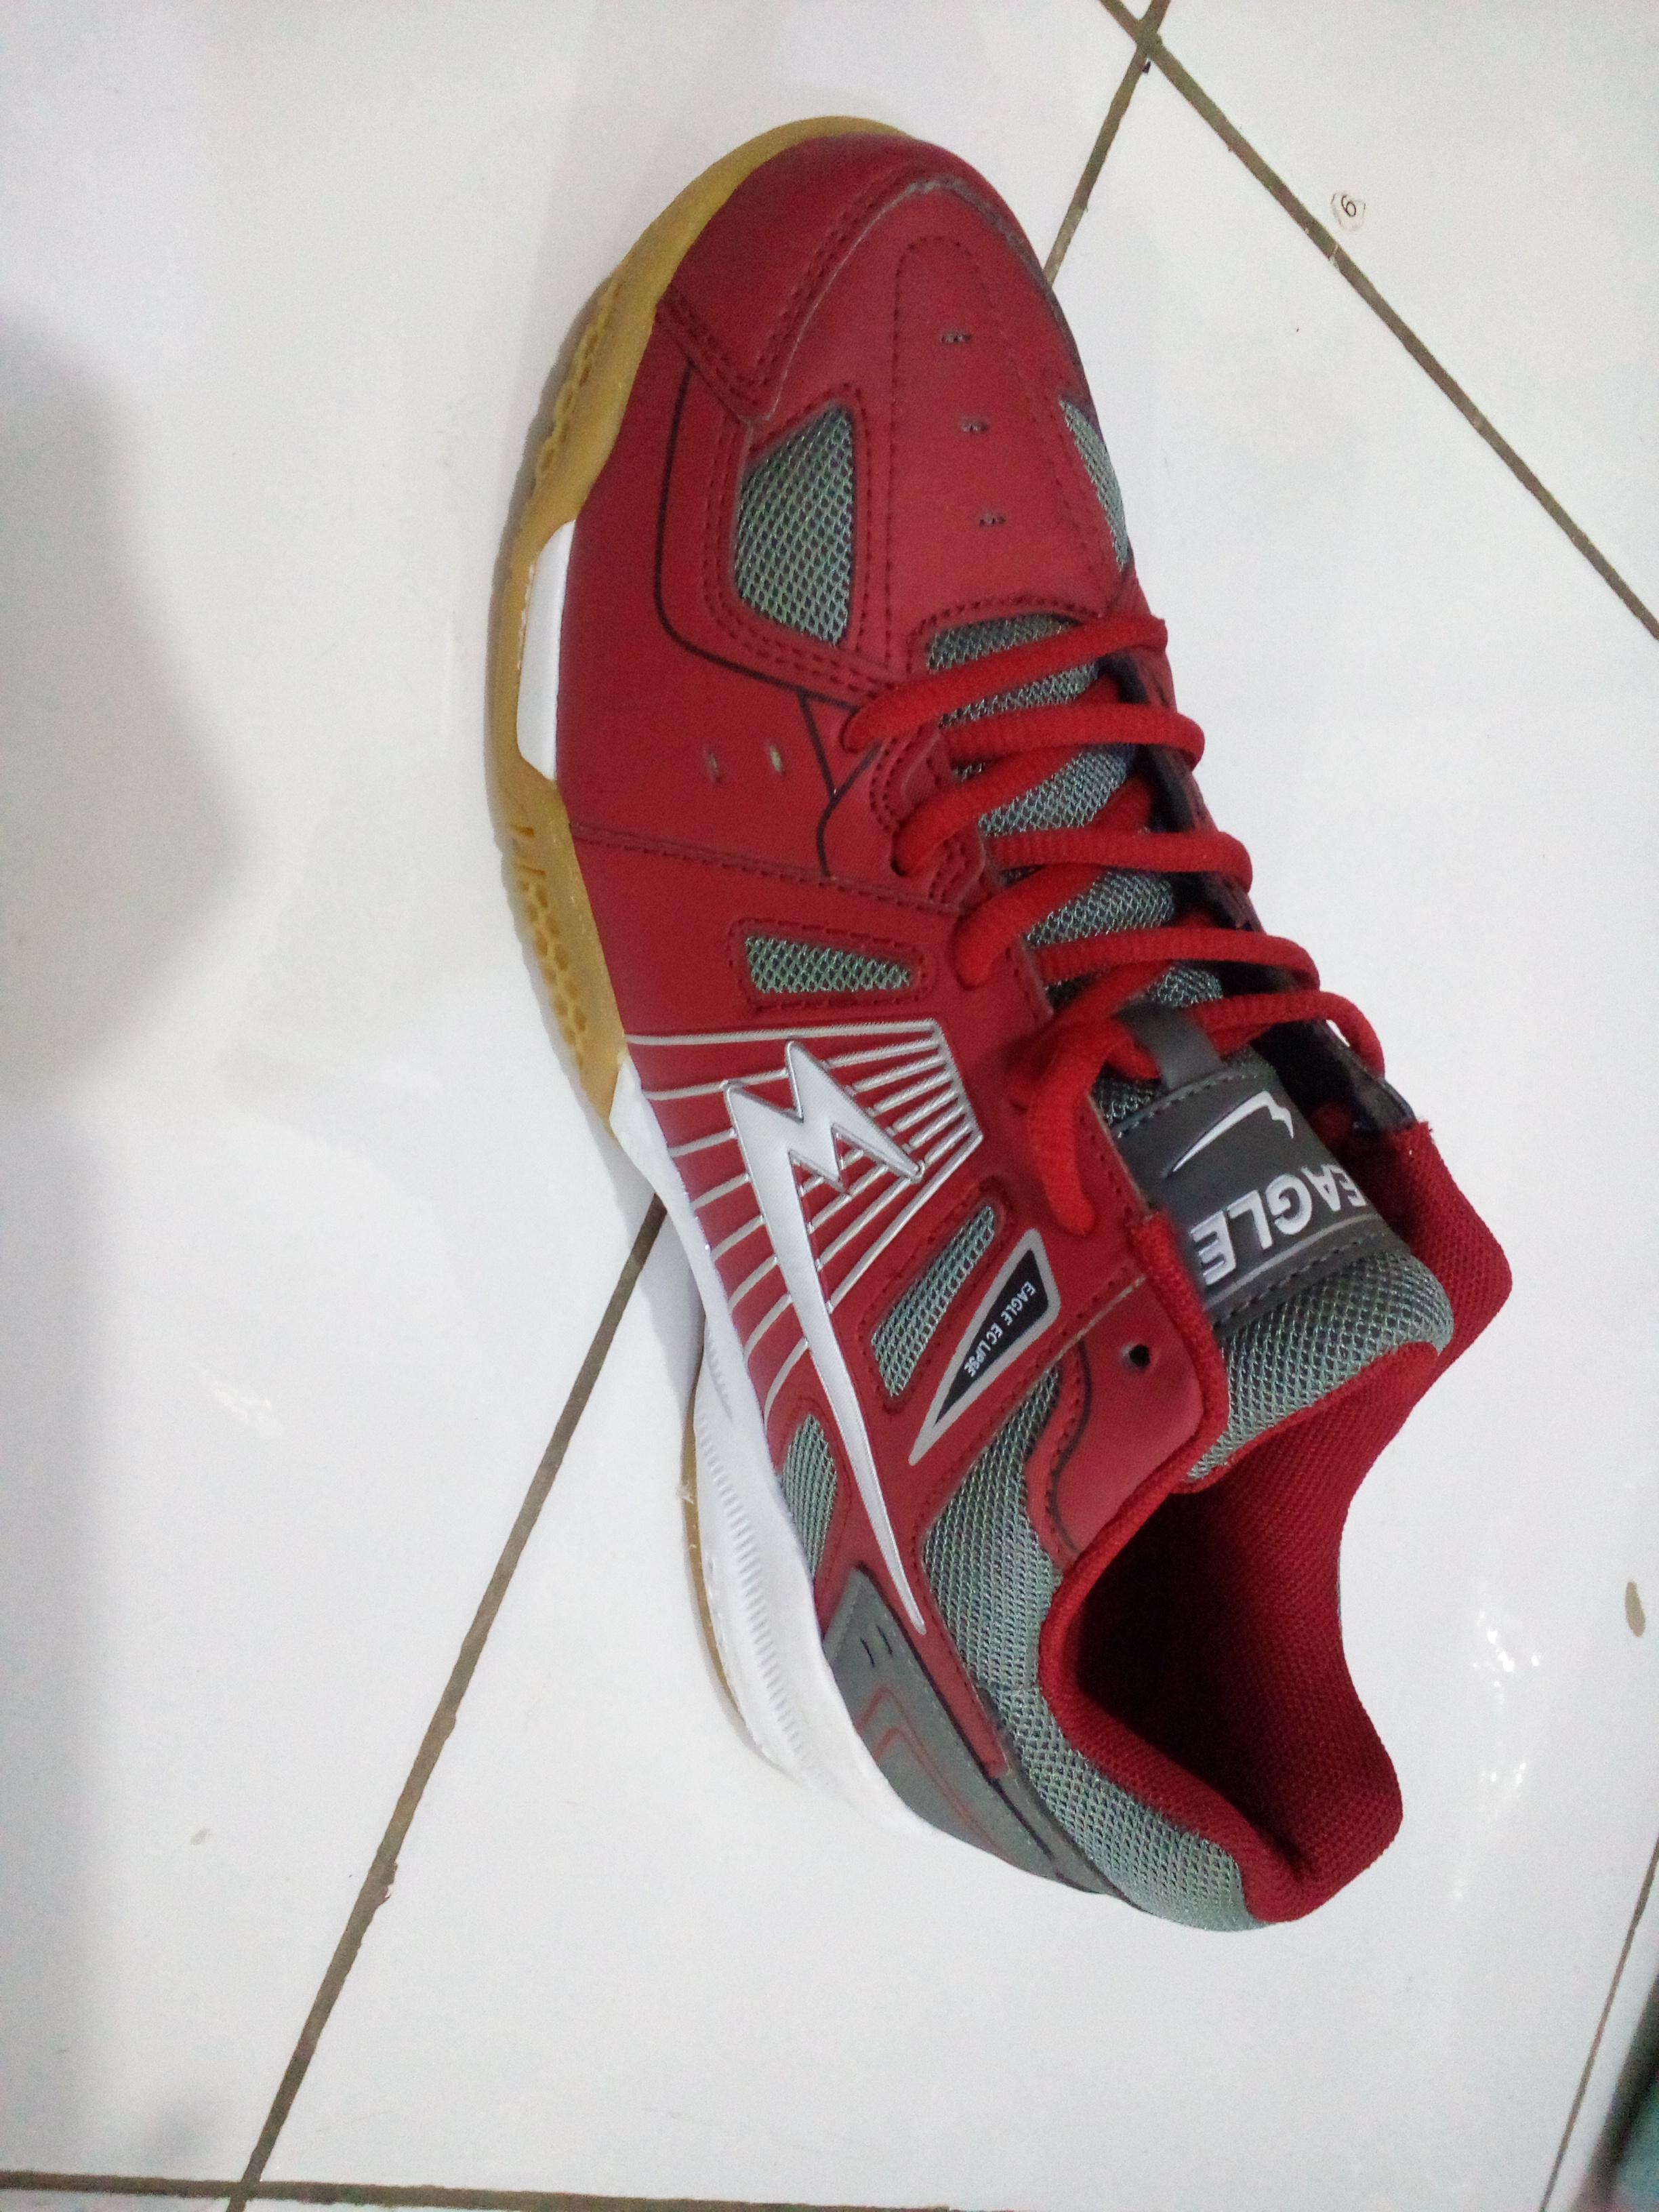 Jual Sepatu Eagle Terbaru Eclipse Badminton